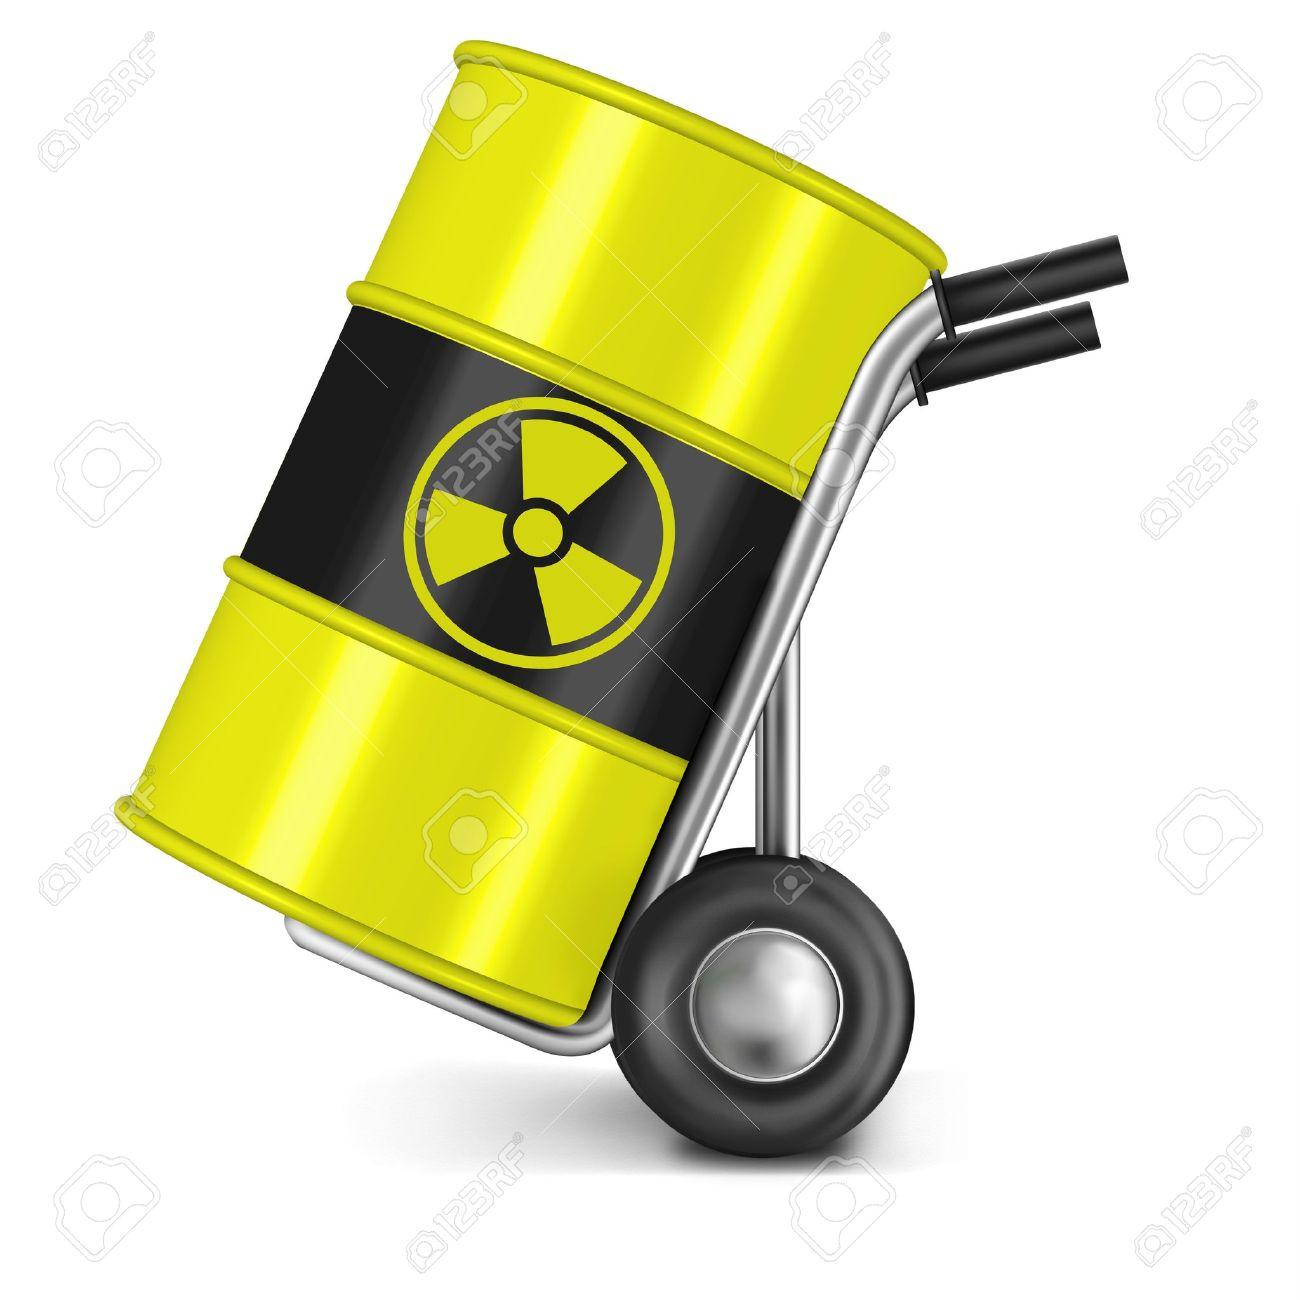 barrel with radio active waste nuclear power station waiste dangerous hazard of gamma radiation radioactive radiance risk radium uranium Stock Photo - 9092704